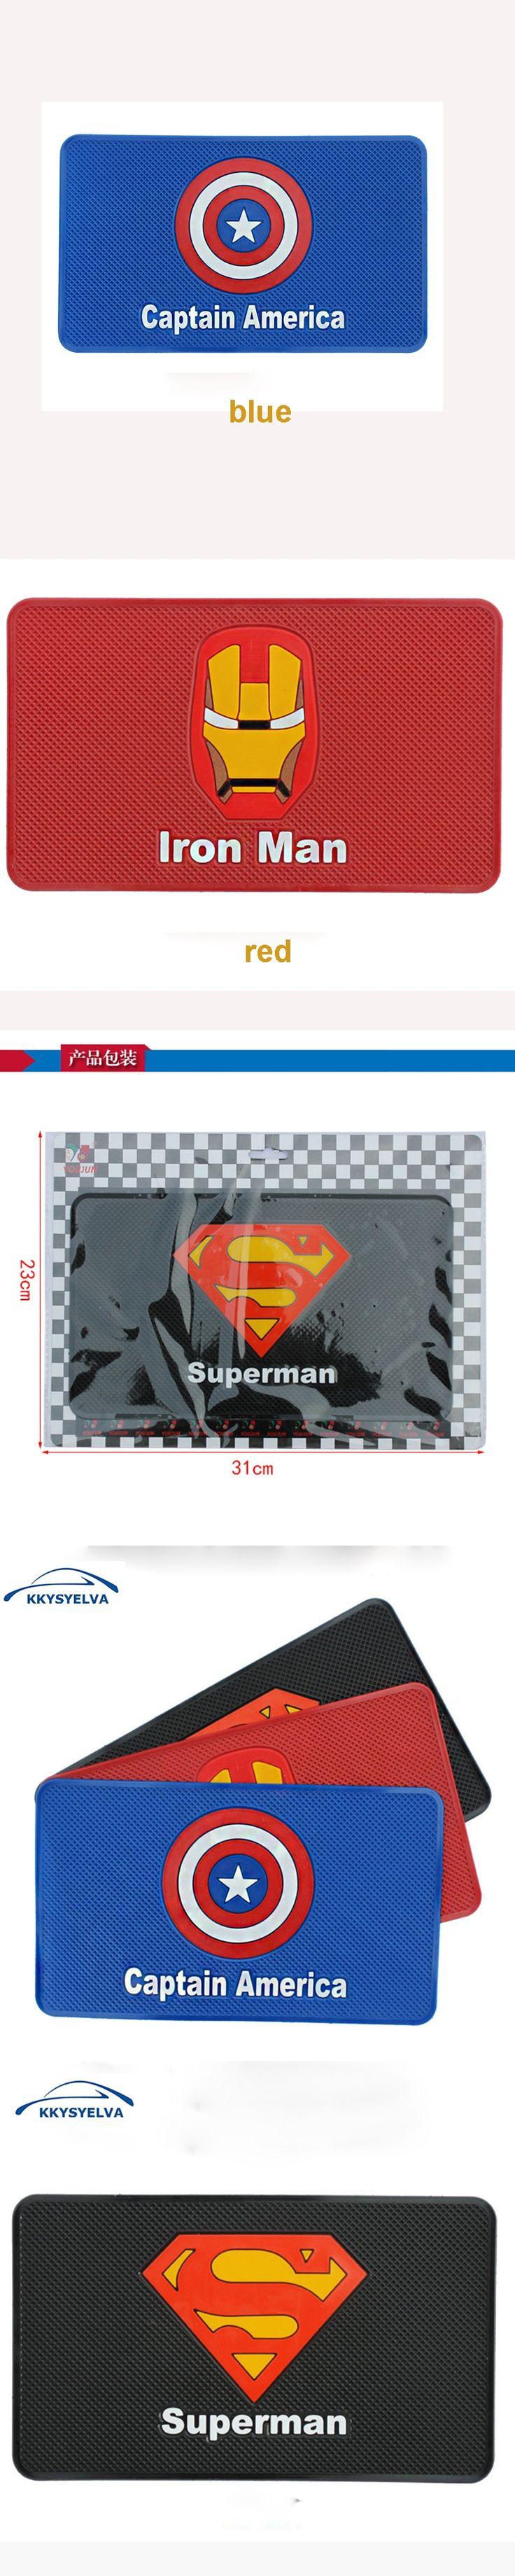 KKYSYELVA 31x23cm Black Car Anti-Slip Mat Non-slip Mobile Mat Cell Phone Key Holder Car Dashboard Sticky Pad